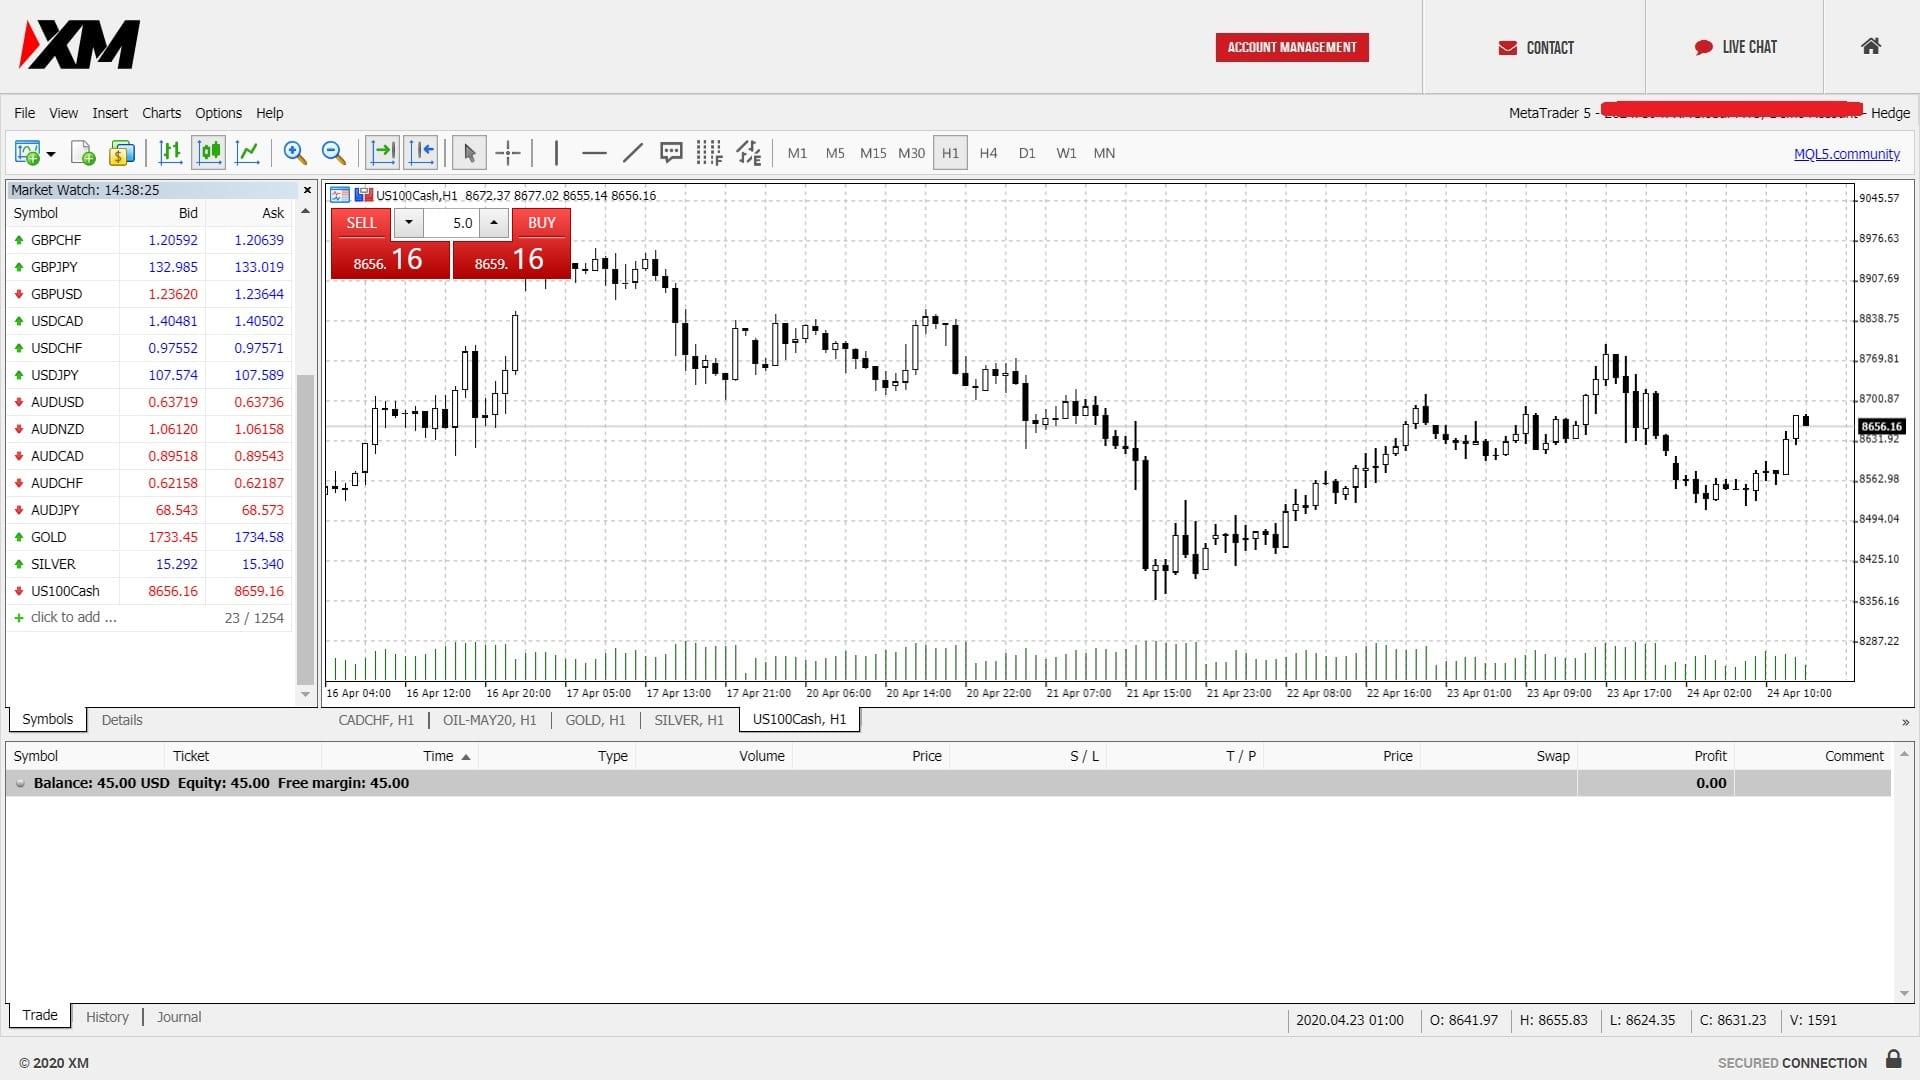 NASDAQ 100 trading on XM's MT5 platform